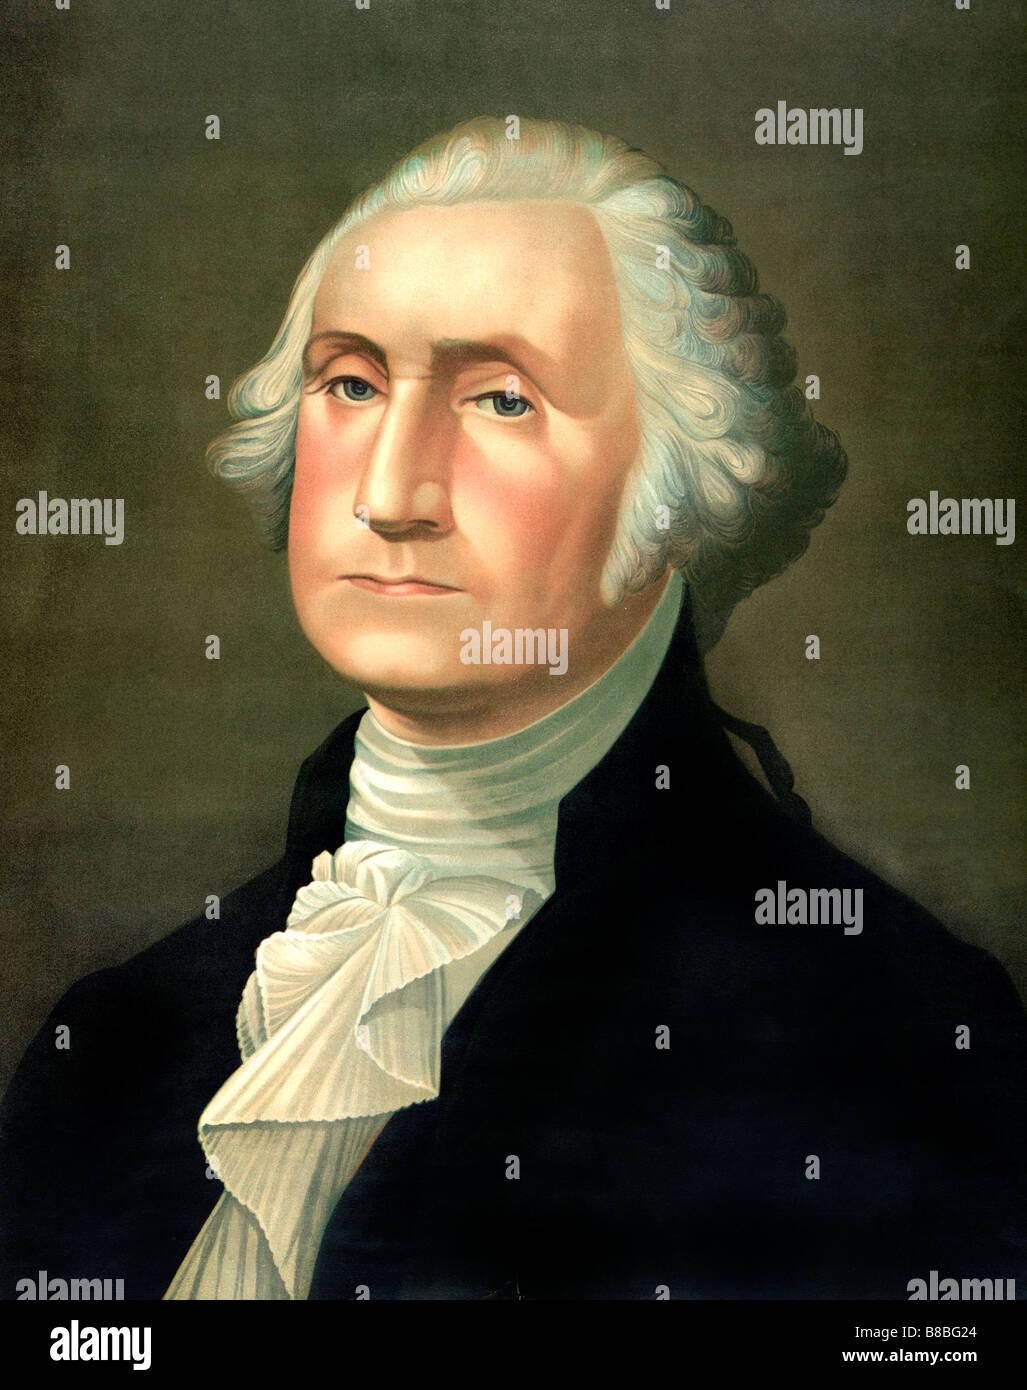 Head And Shoulders Portrait Of George Washington